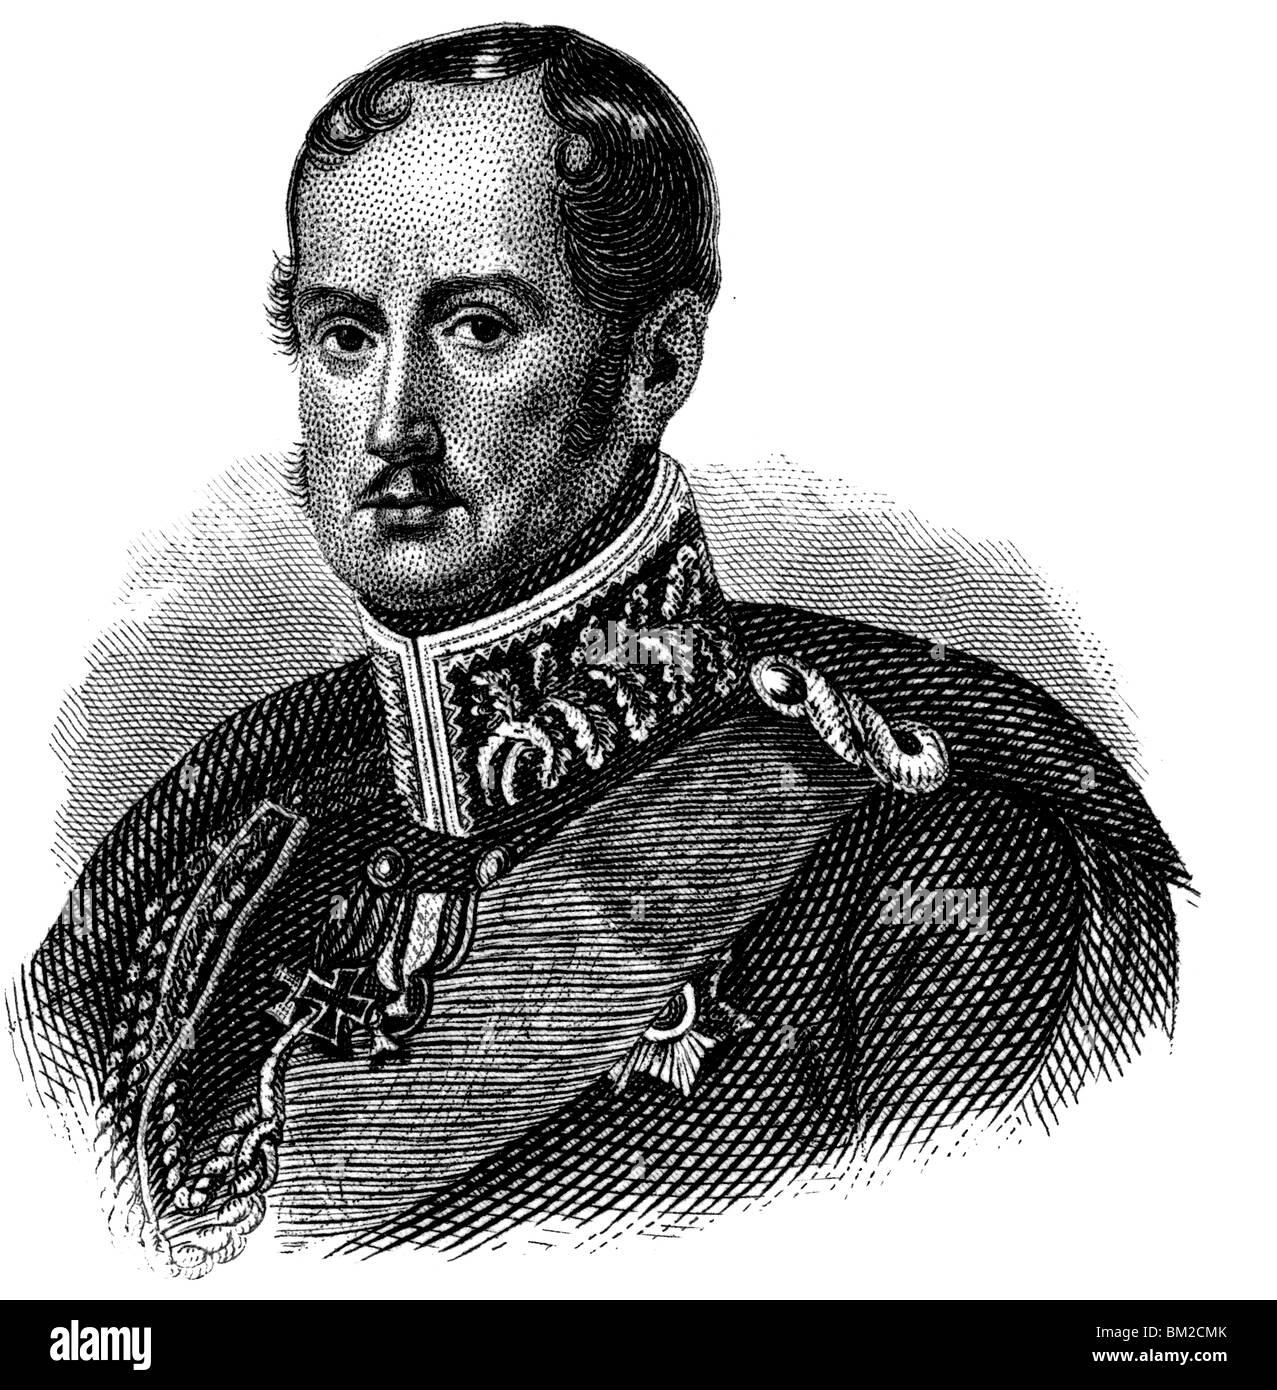 Frederick William III of Prussia - Stock Image